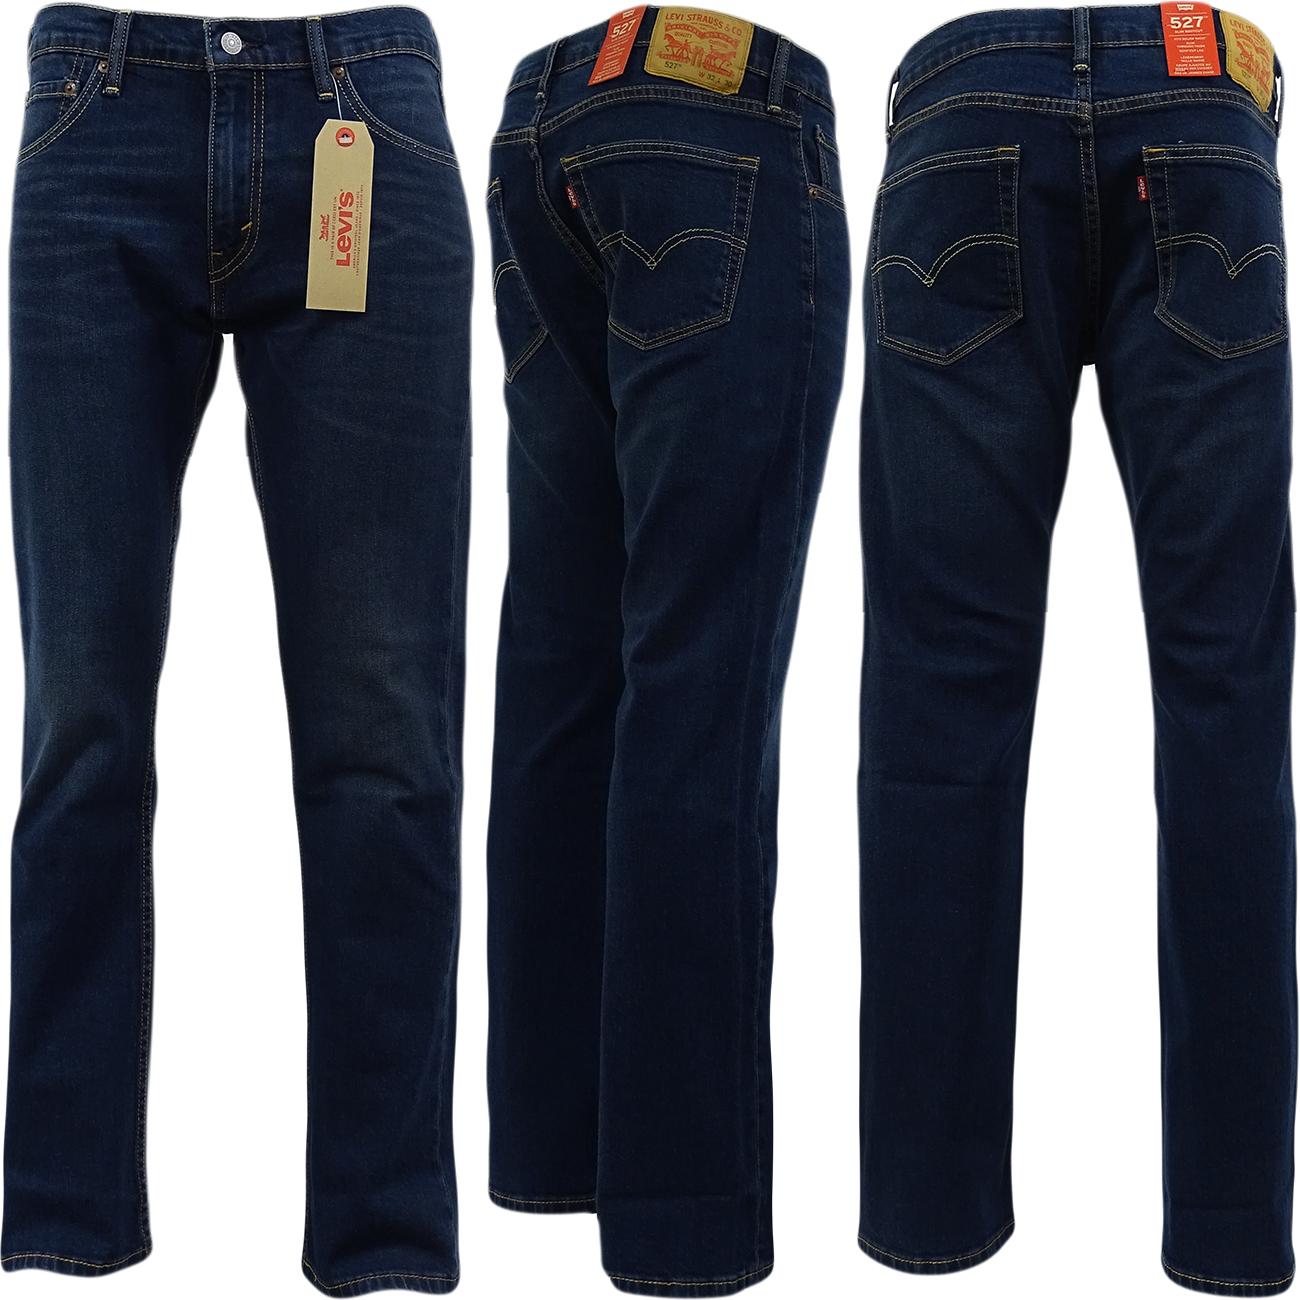 mens levi strauss 527 bootcut jean 39 california 39 denim pants trouser ebay. Black Bedroom Furniture Sets. Home Design Ideas